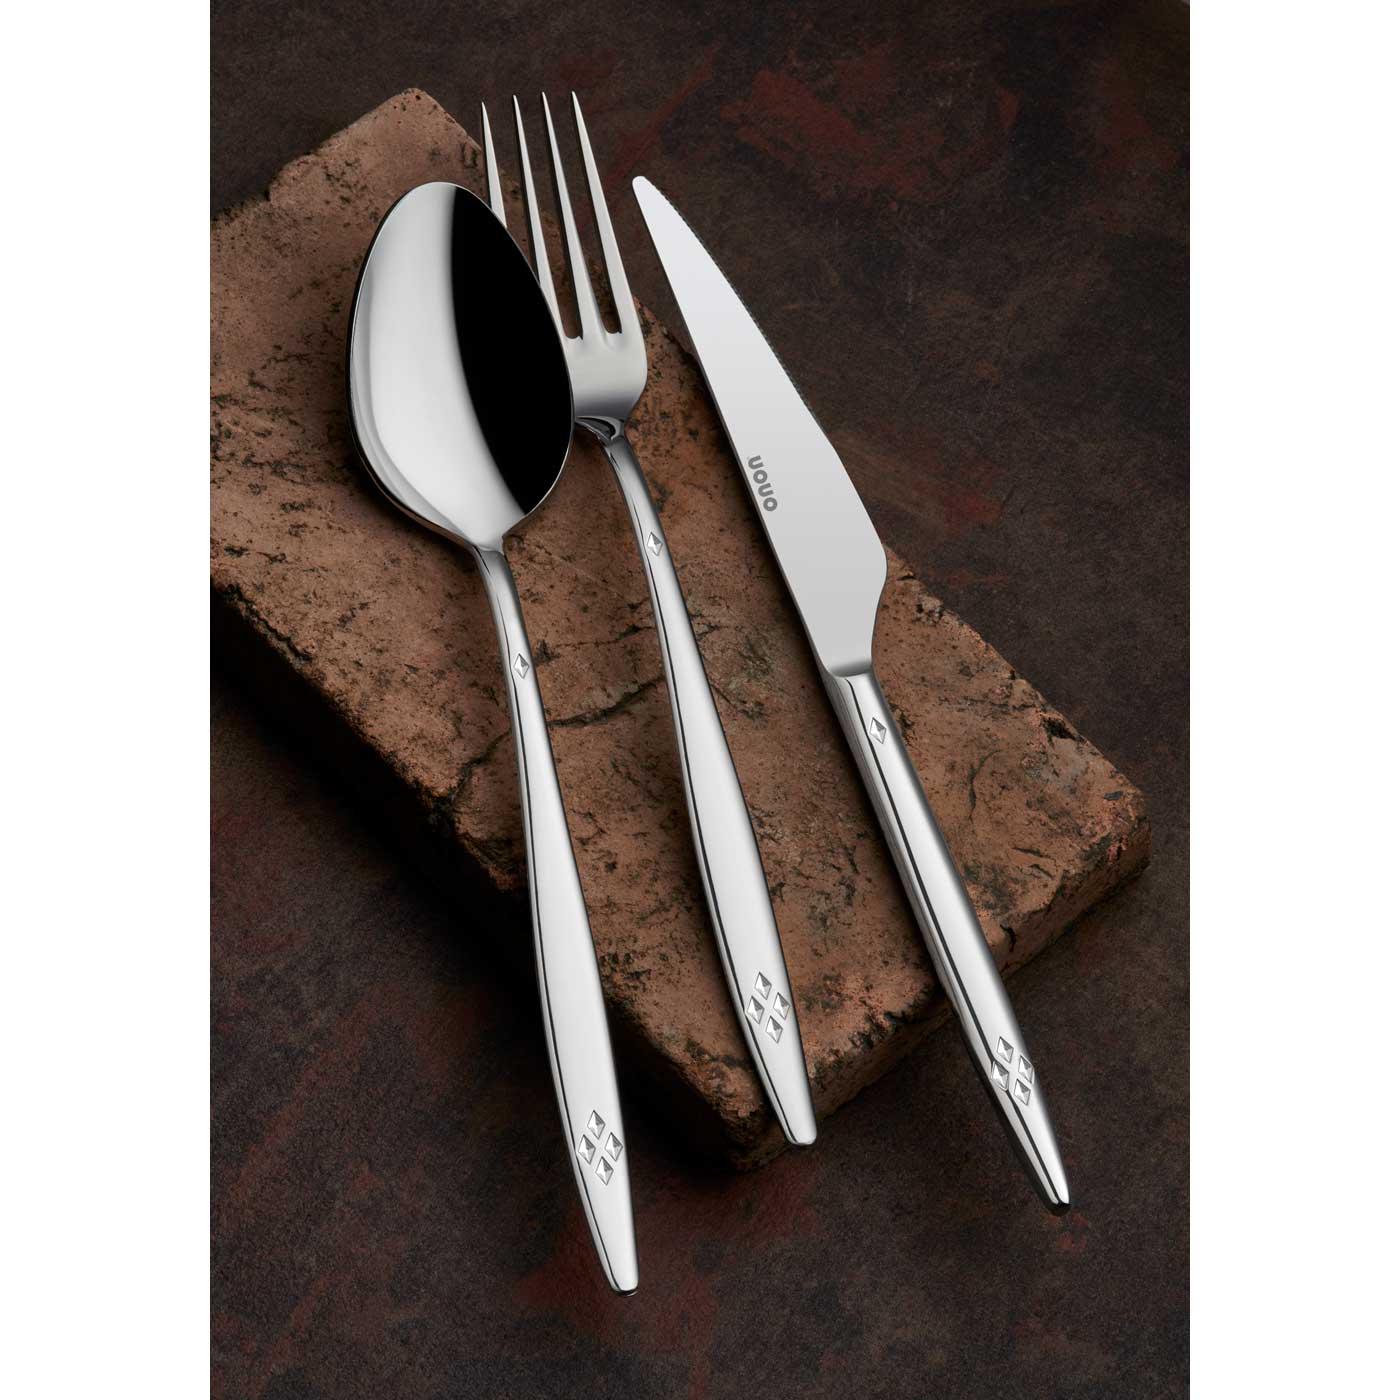 ONON Mira Sade 6 Adet Yemek Çatalı 2